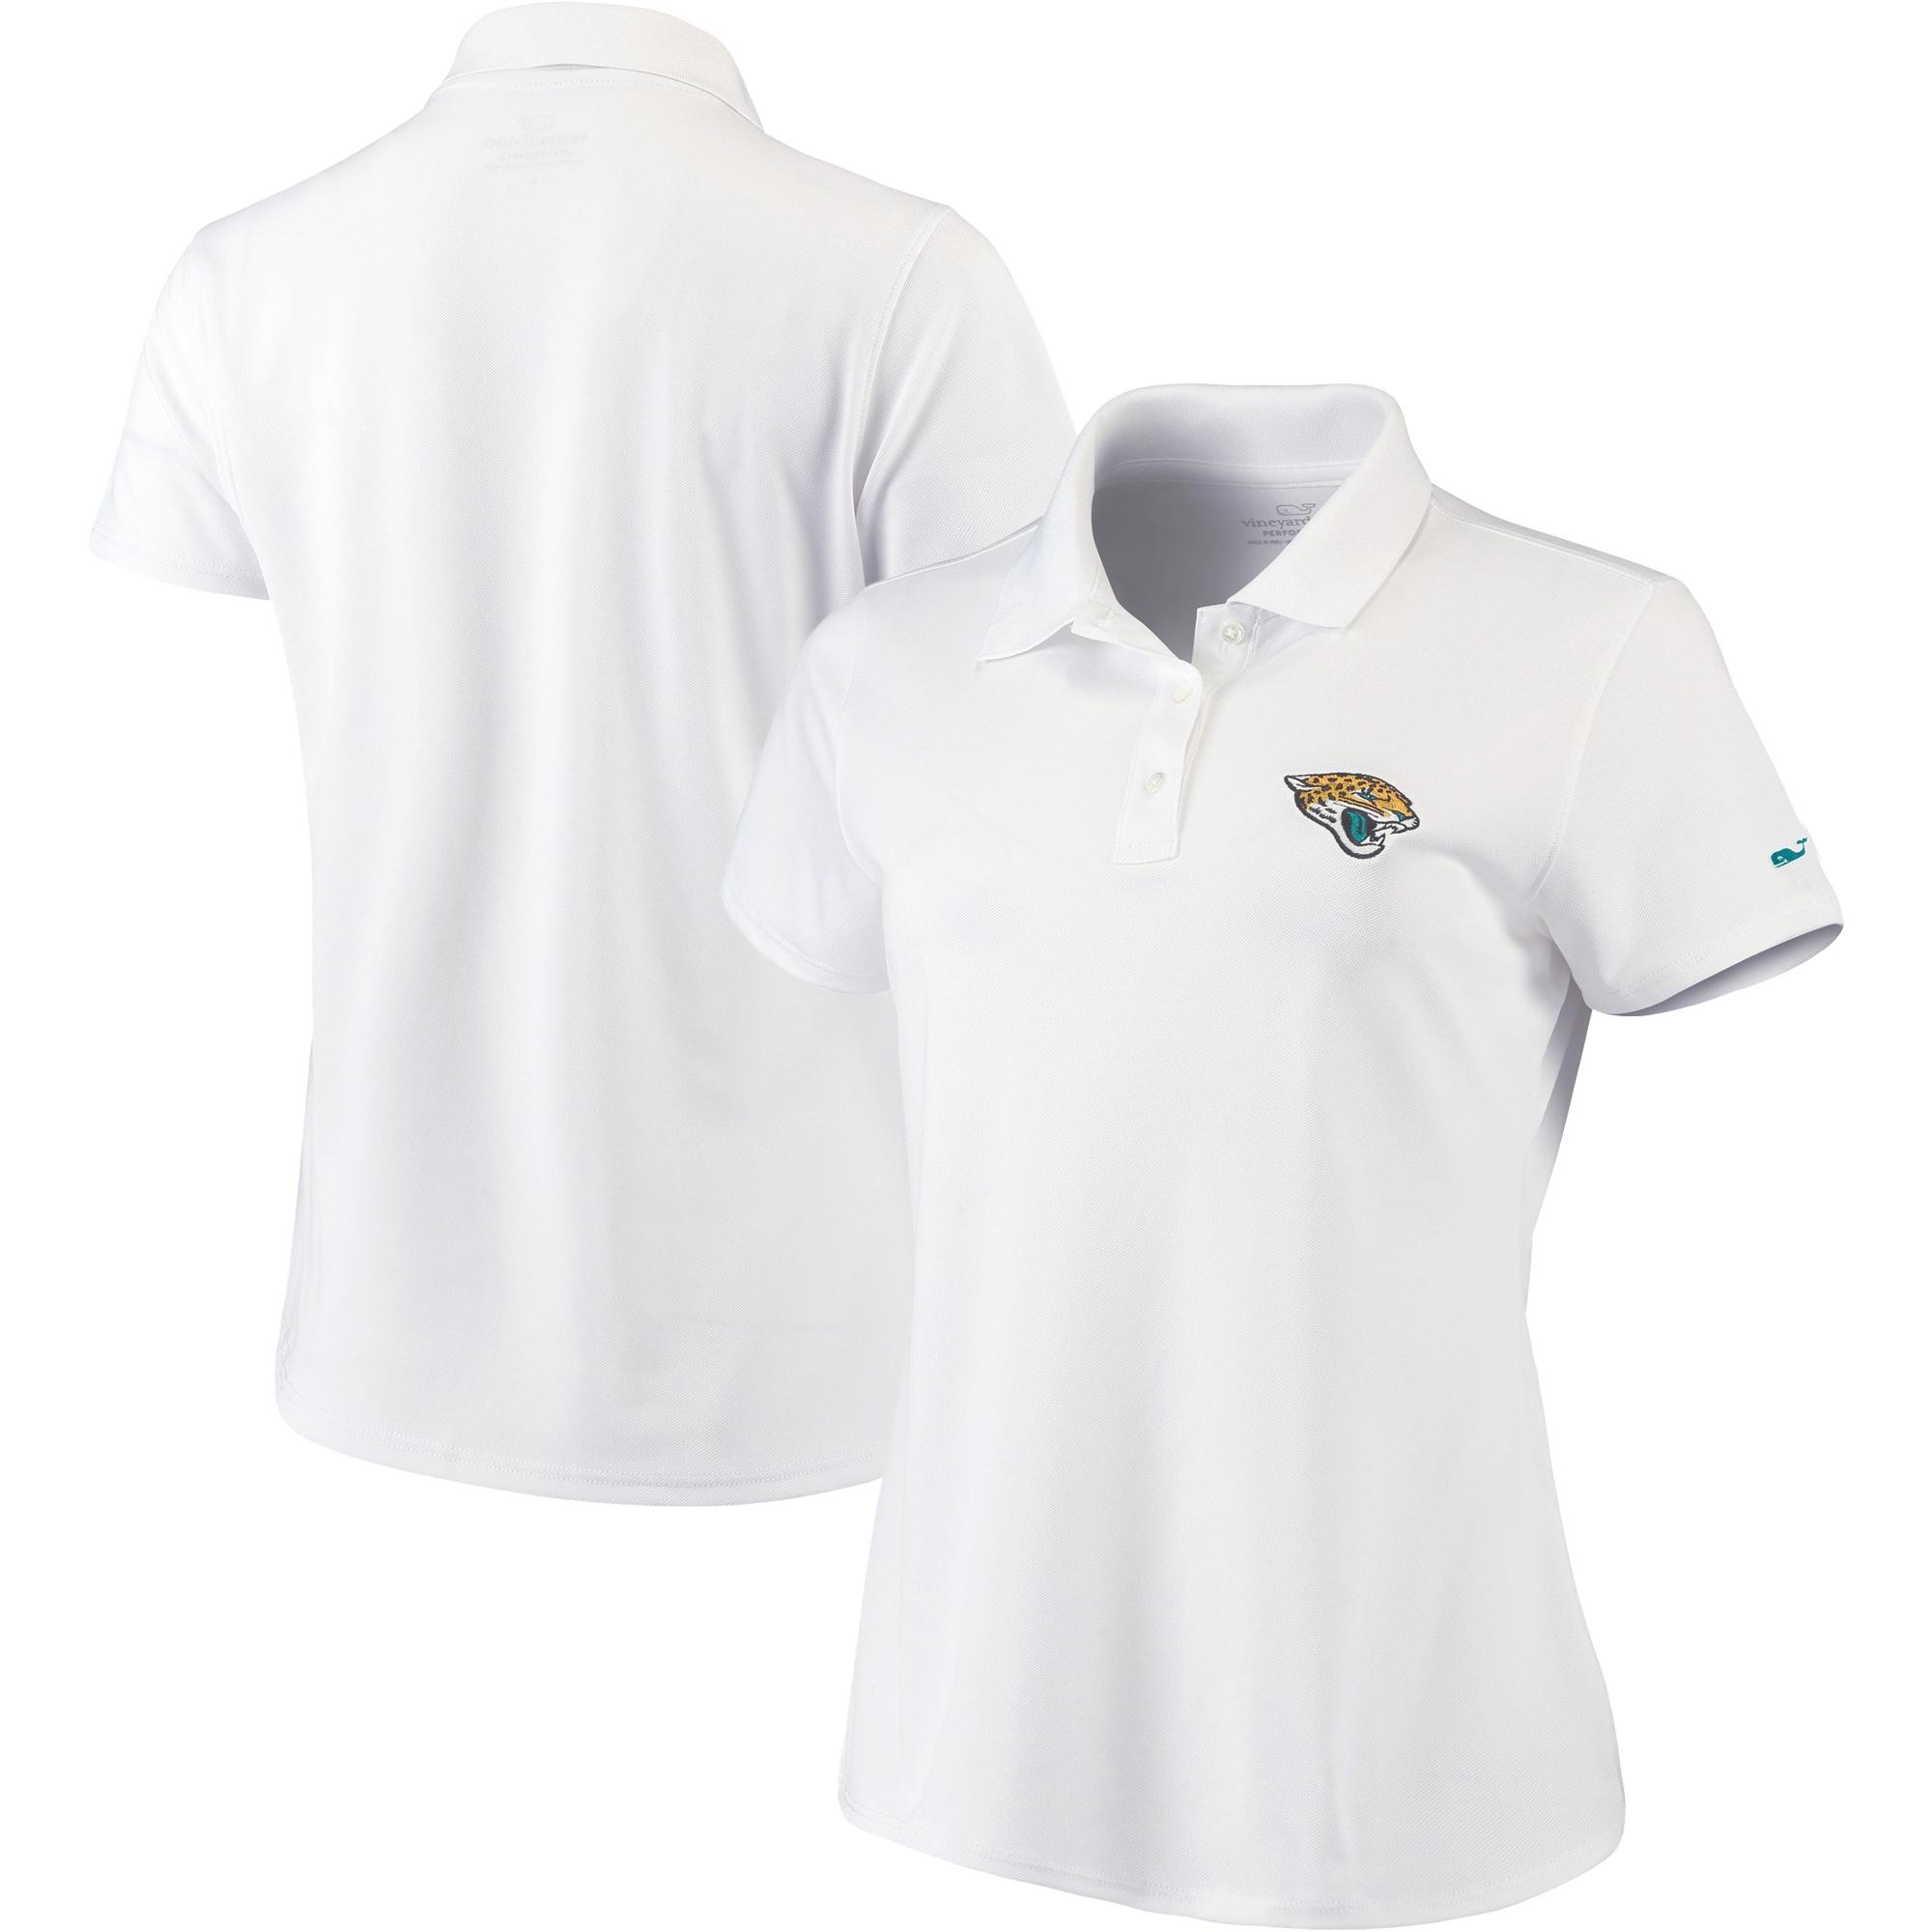 Jacksonville Jaguars Vineyard Vines Women's Pique Sport Performance Polo - White